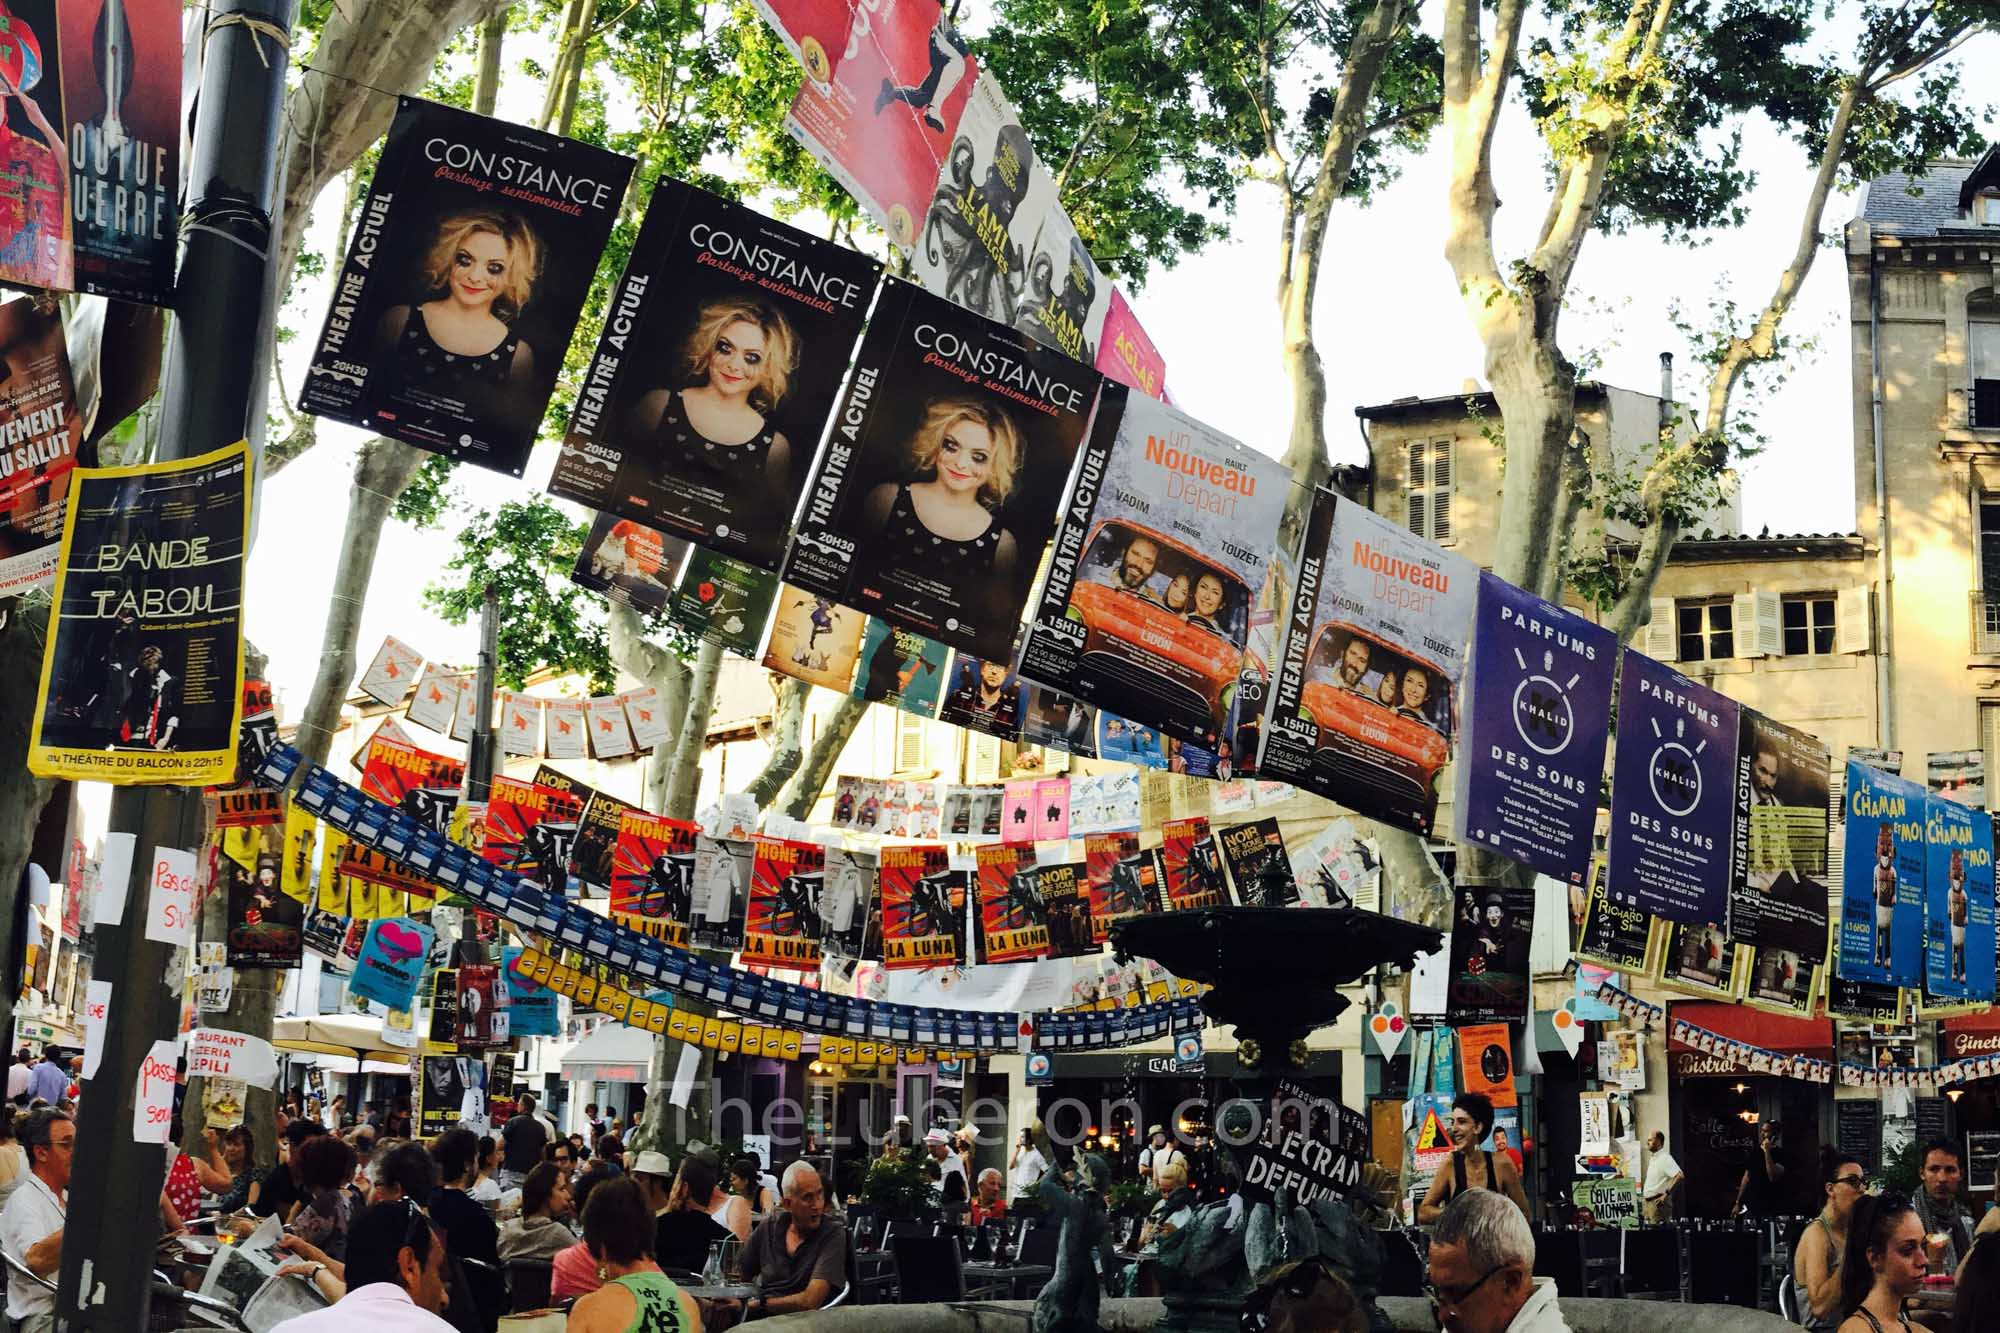 Avignon festival posters